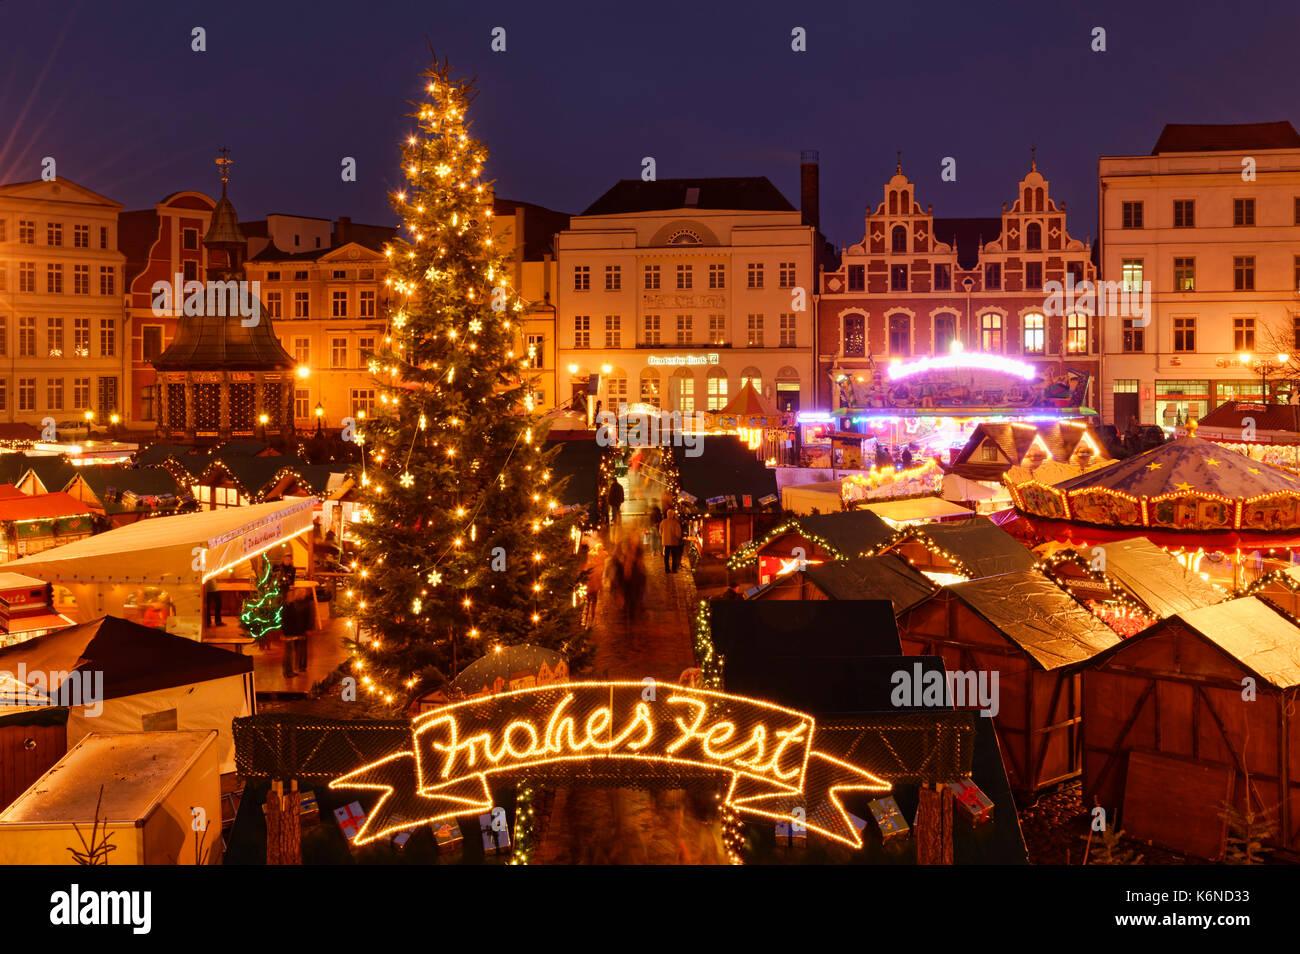 Wismar: Christmas fair on the market square, Mecklenburg-Vorpommern, Germany - Stock Image